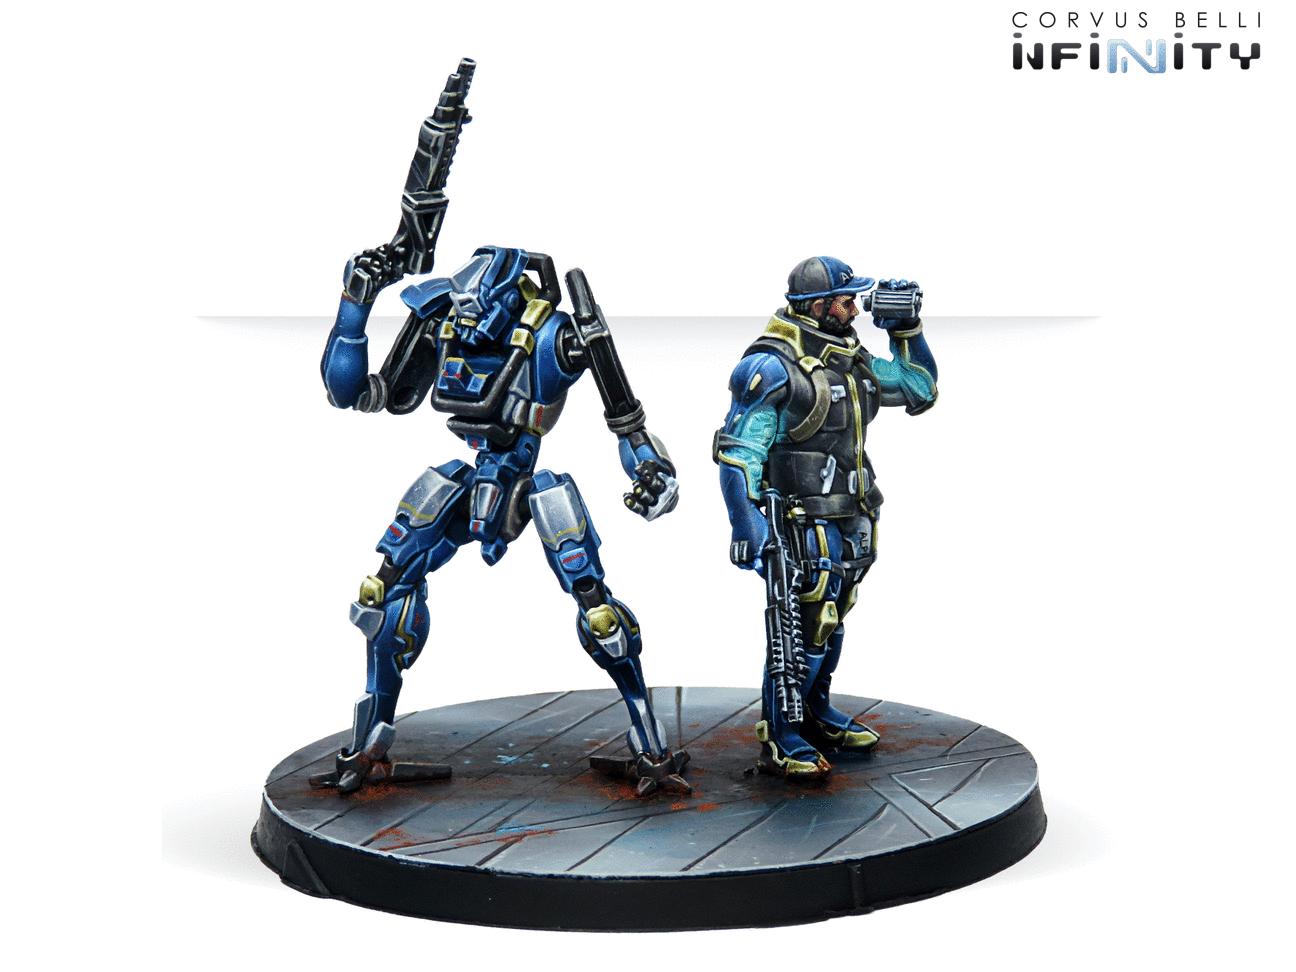 INF - 0-12 - Alpha Unit